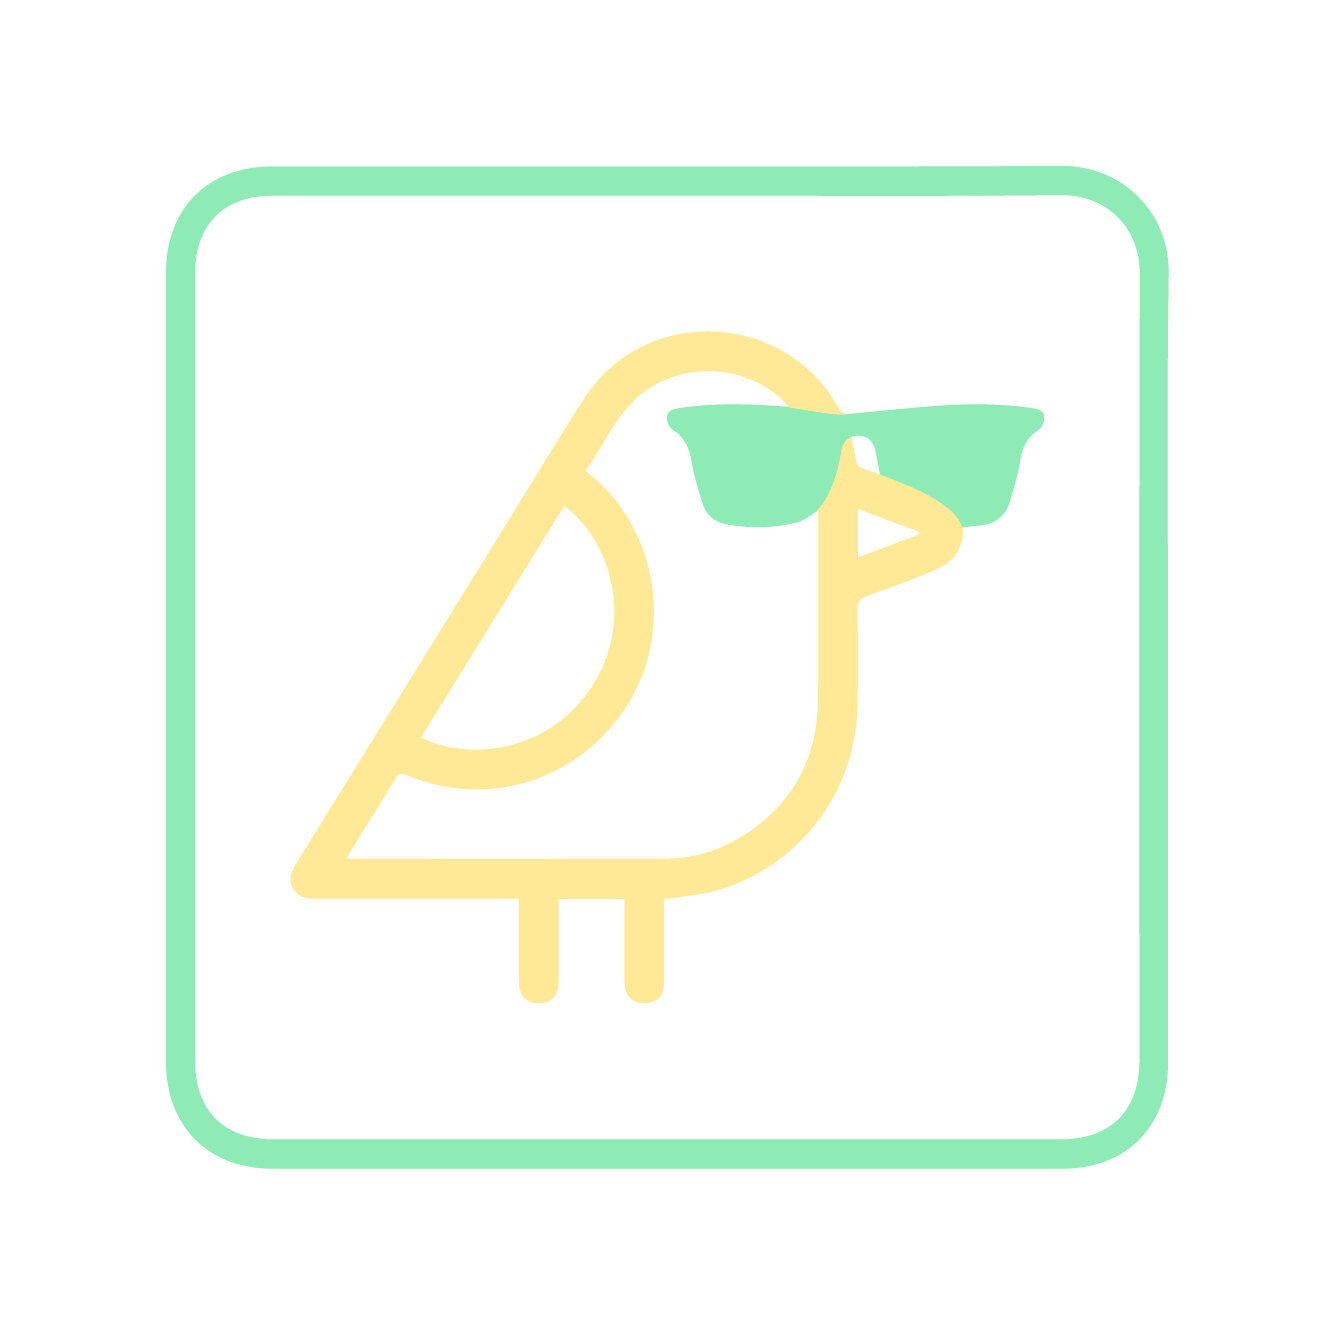 Chic-cheep-with-sunglasses.jpg